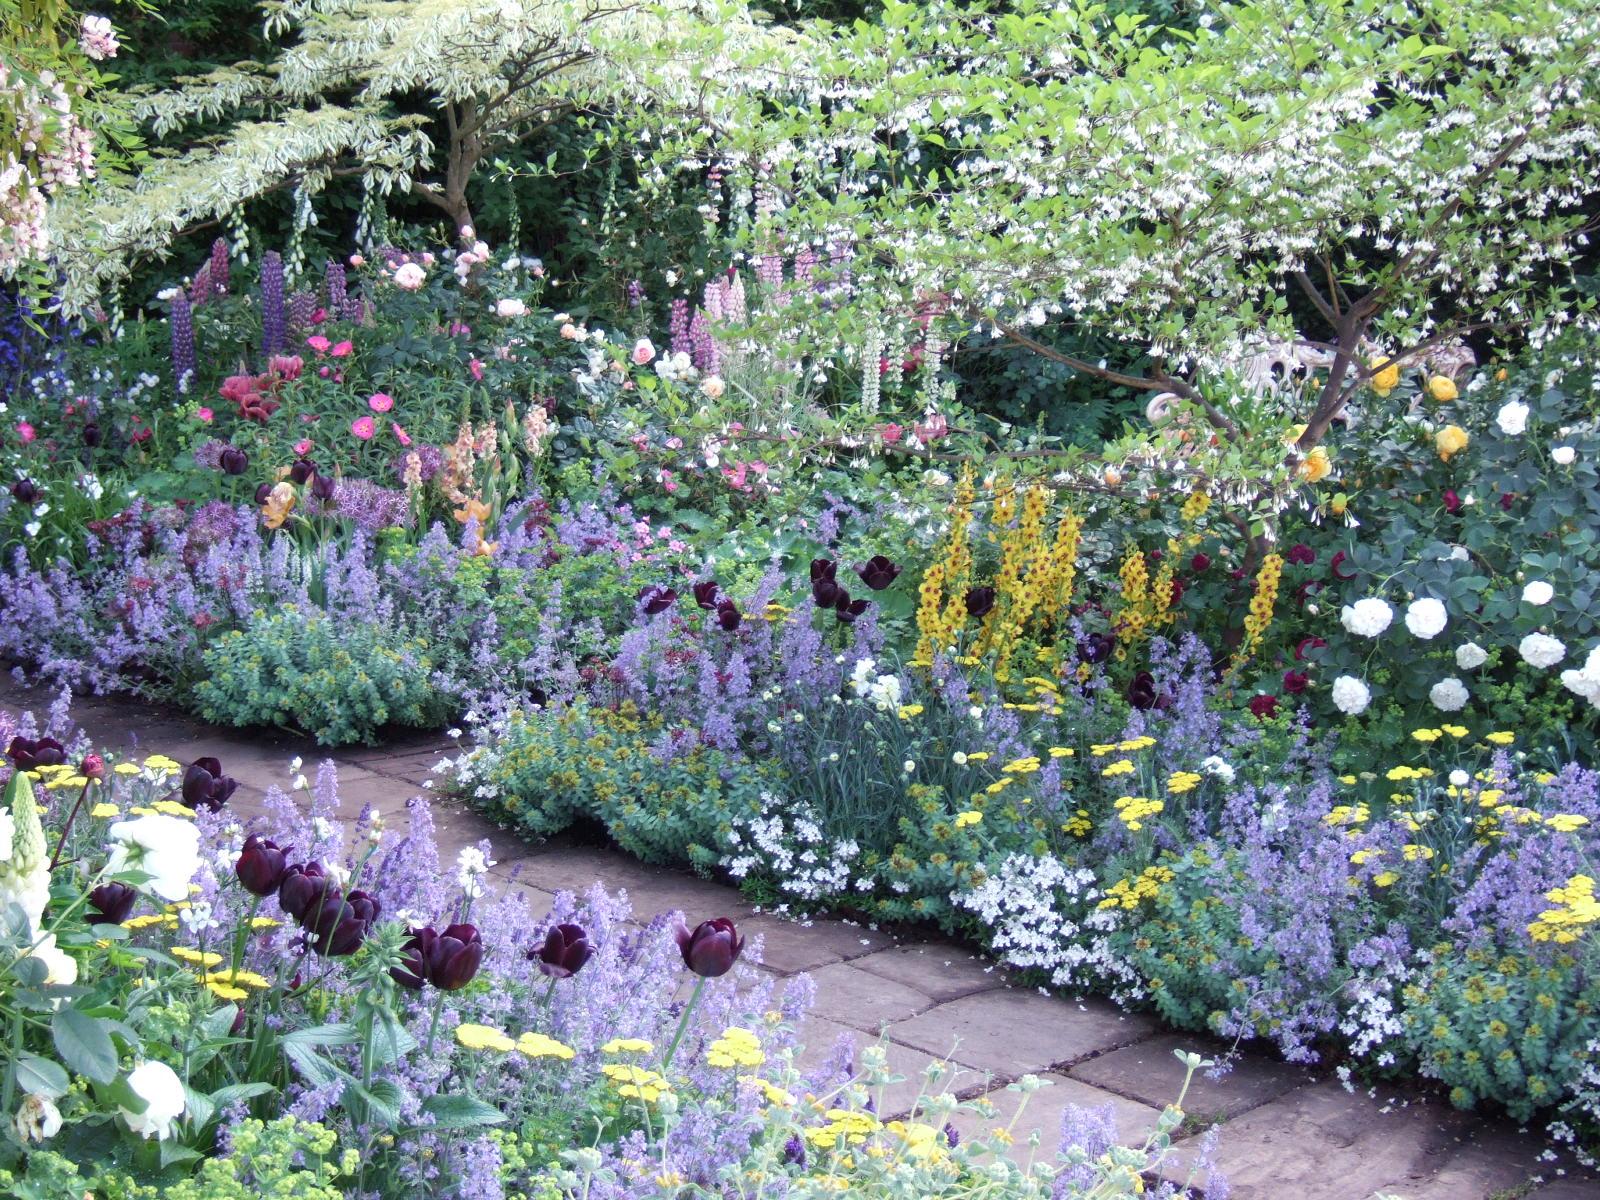 [24May07+Along+the+garden+path+in+Chris+Beardshaw]